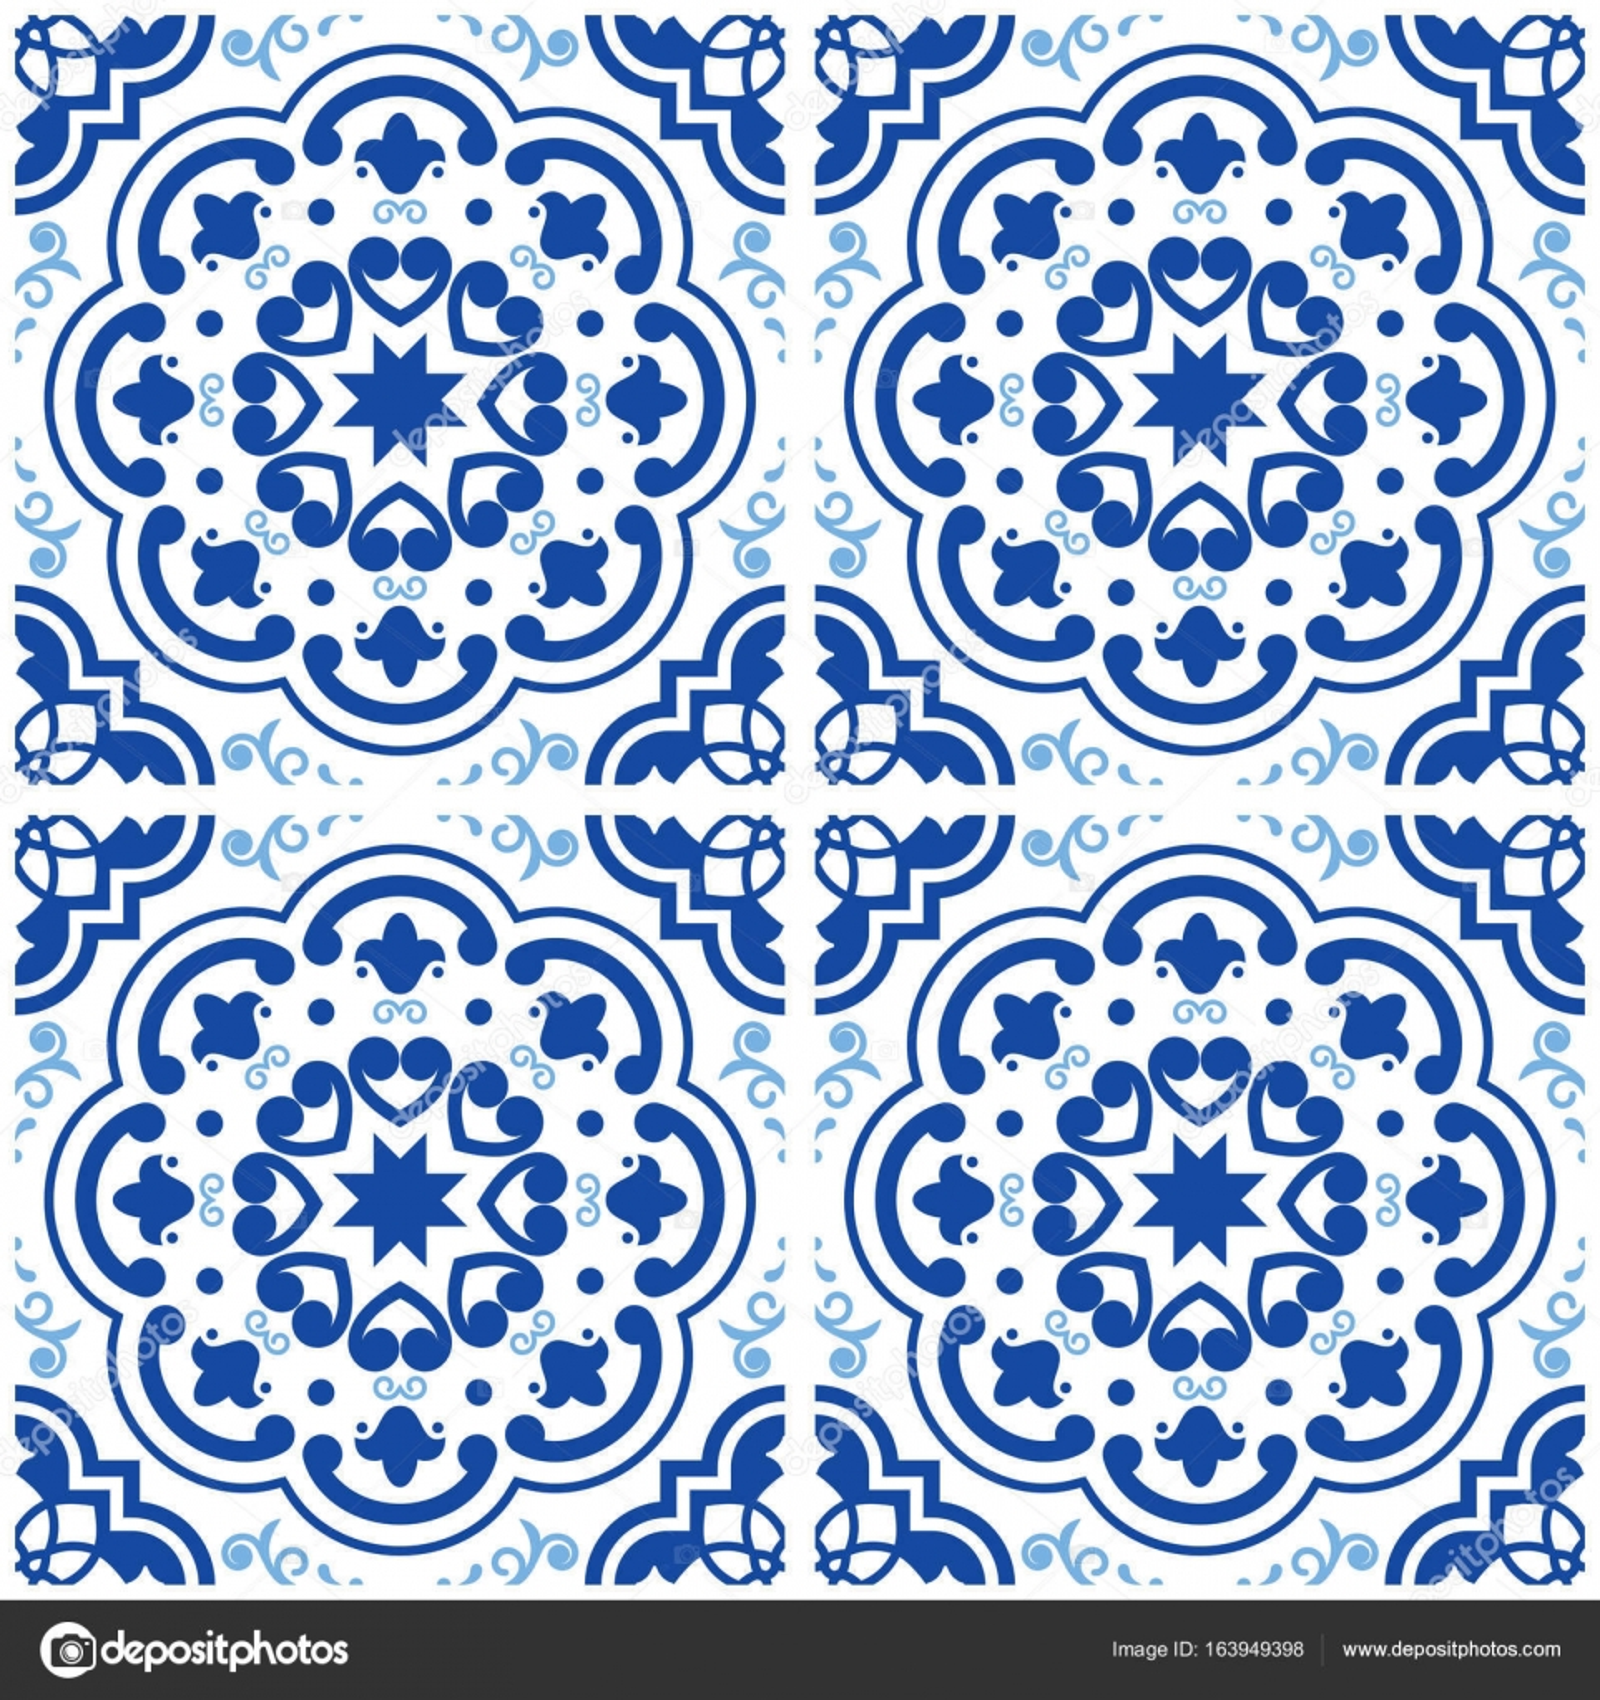 Azulejos Portuguese tile floor pattern, Lisbon seamless indigo blue ...